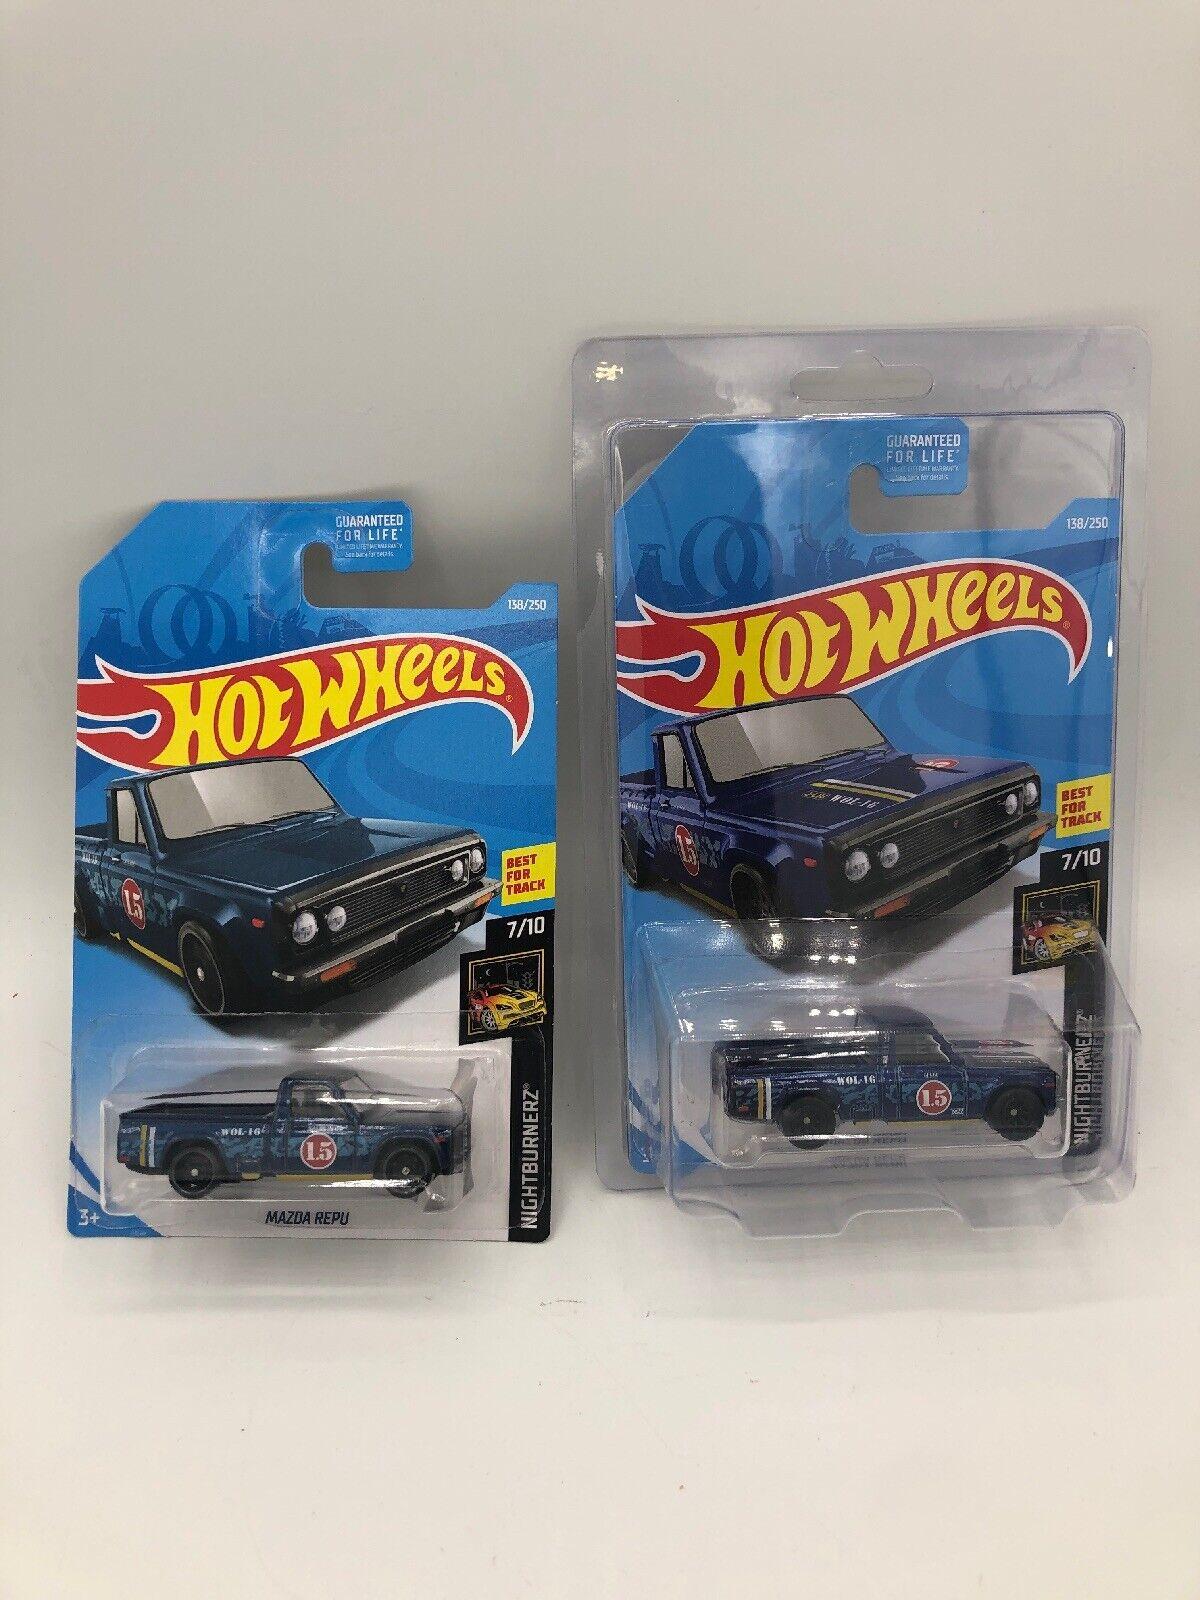 2019 Hot Wheels MAZDA Repu Super Treasure HuntIn Predector W  Basic - 2 Car Lot